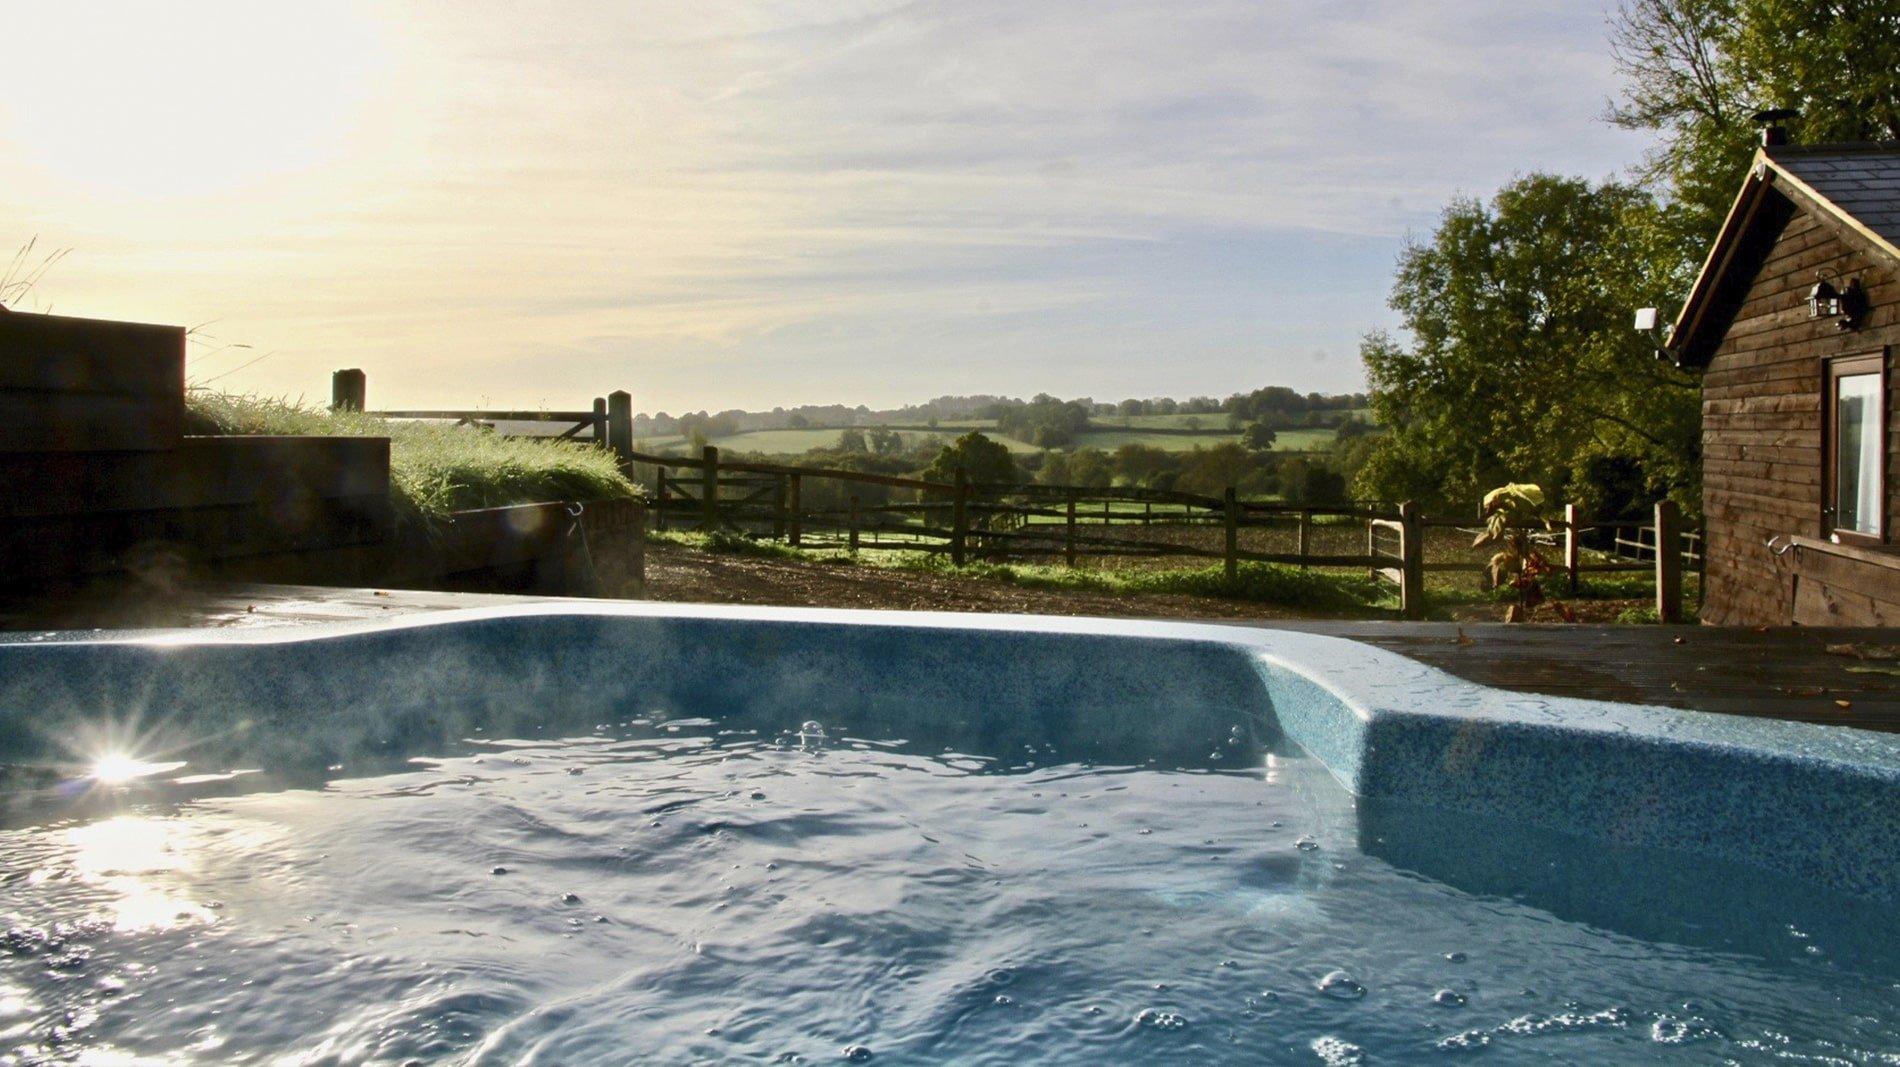 Hot Tub at New House Farm Country Retreat